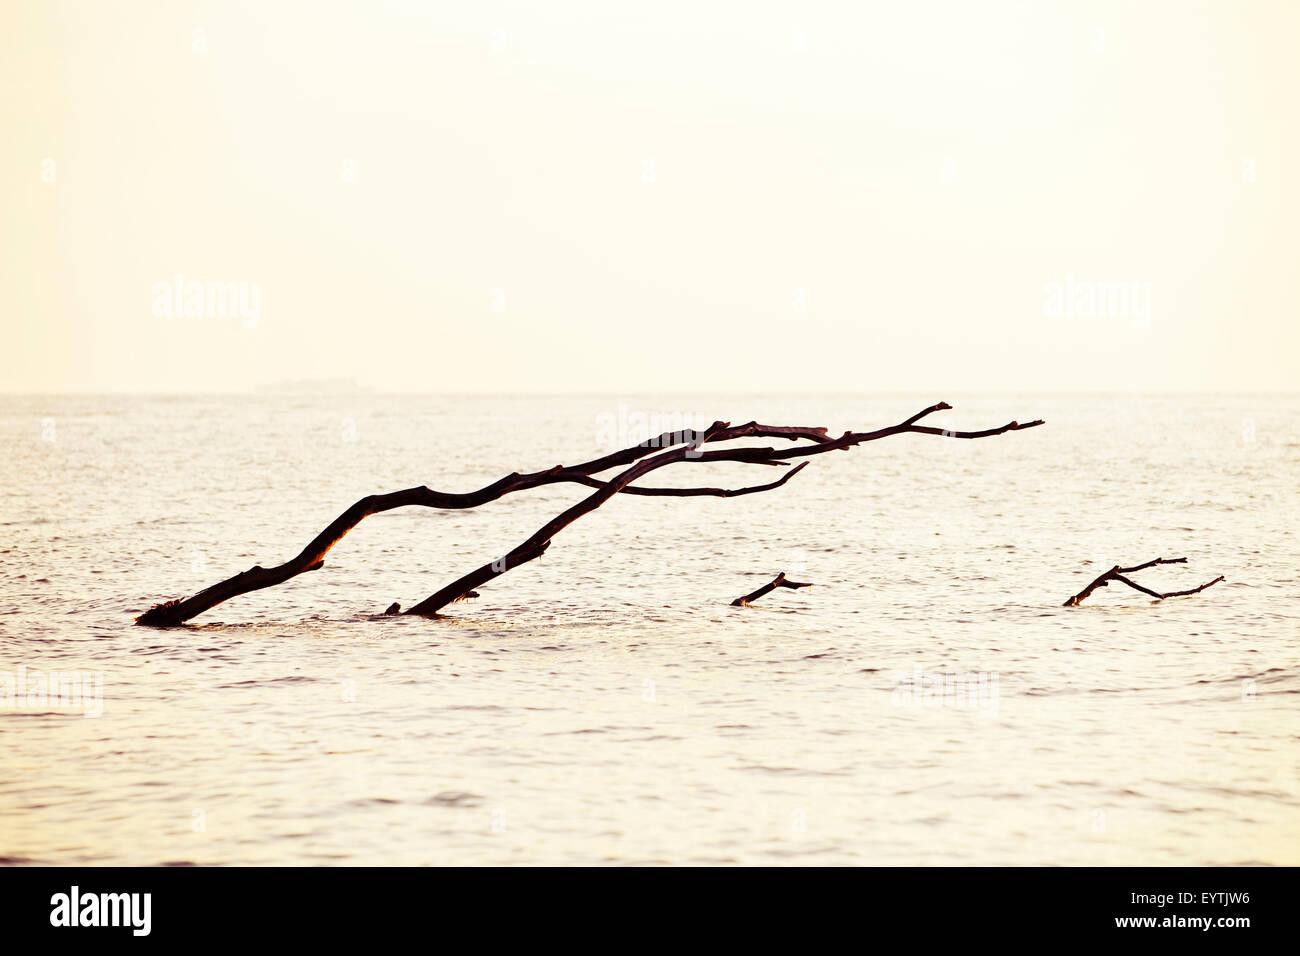 Tree at sea recumbent, passenger liner at horizon - Stock Image